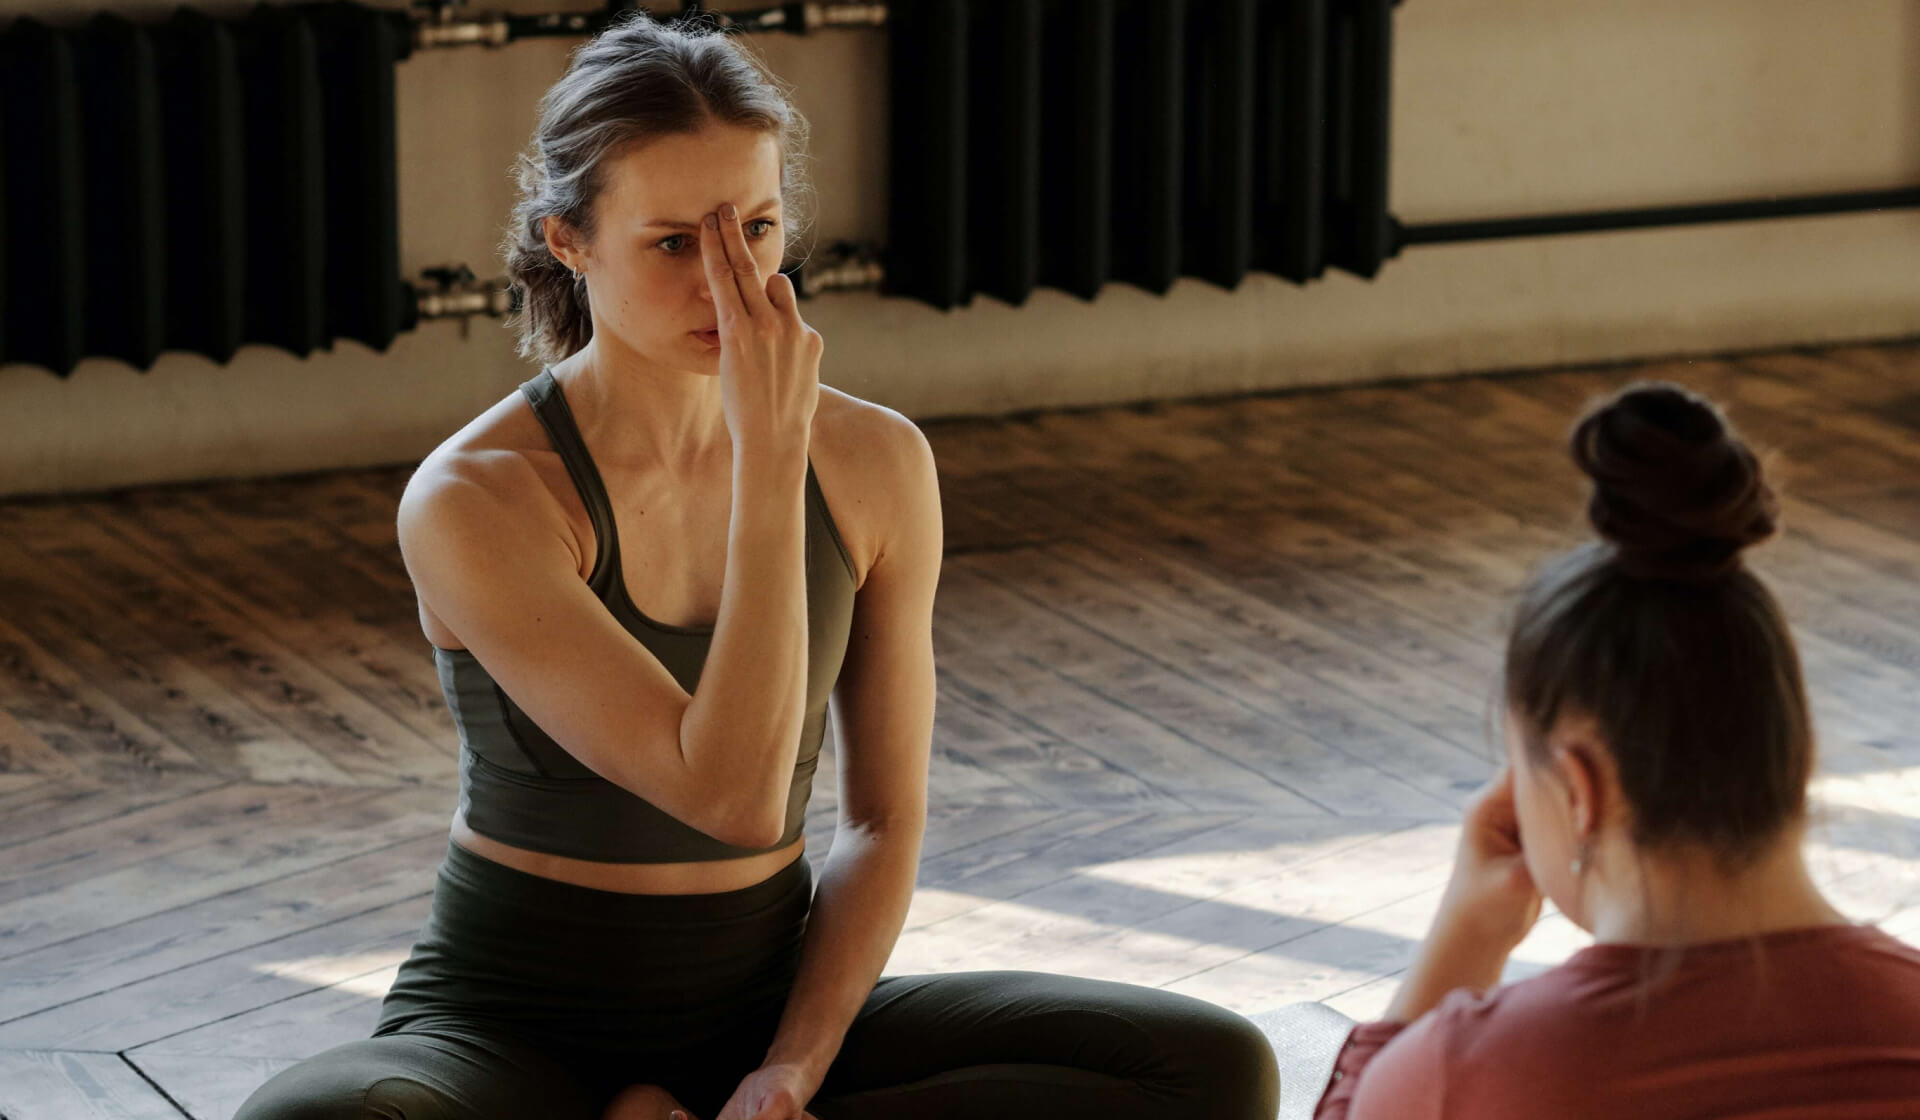 Woman yoga teacher sitting cross-legged teaching nadi shodhana (alternate nostril breath) to another woman